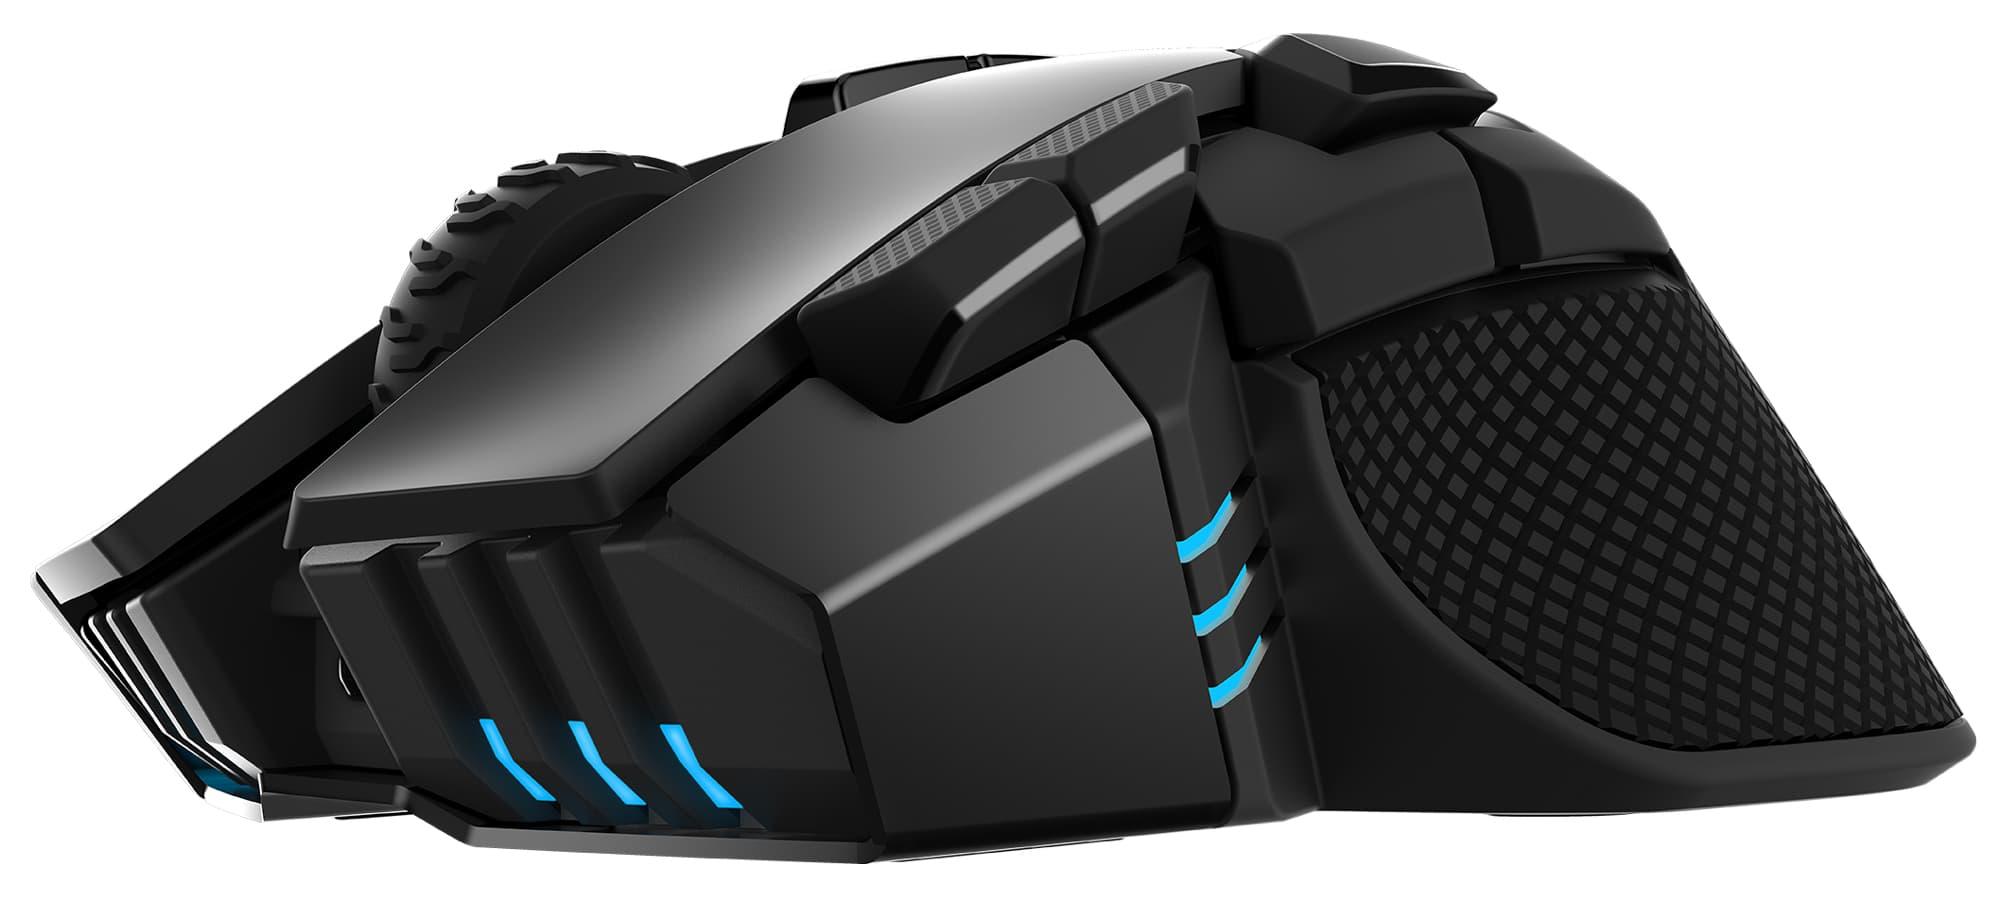 corsair-ironclaw-wireless-3.jpg